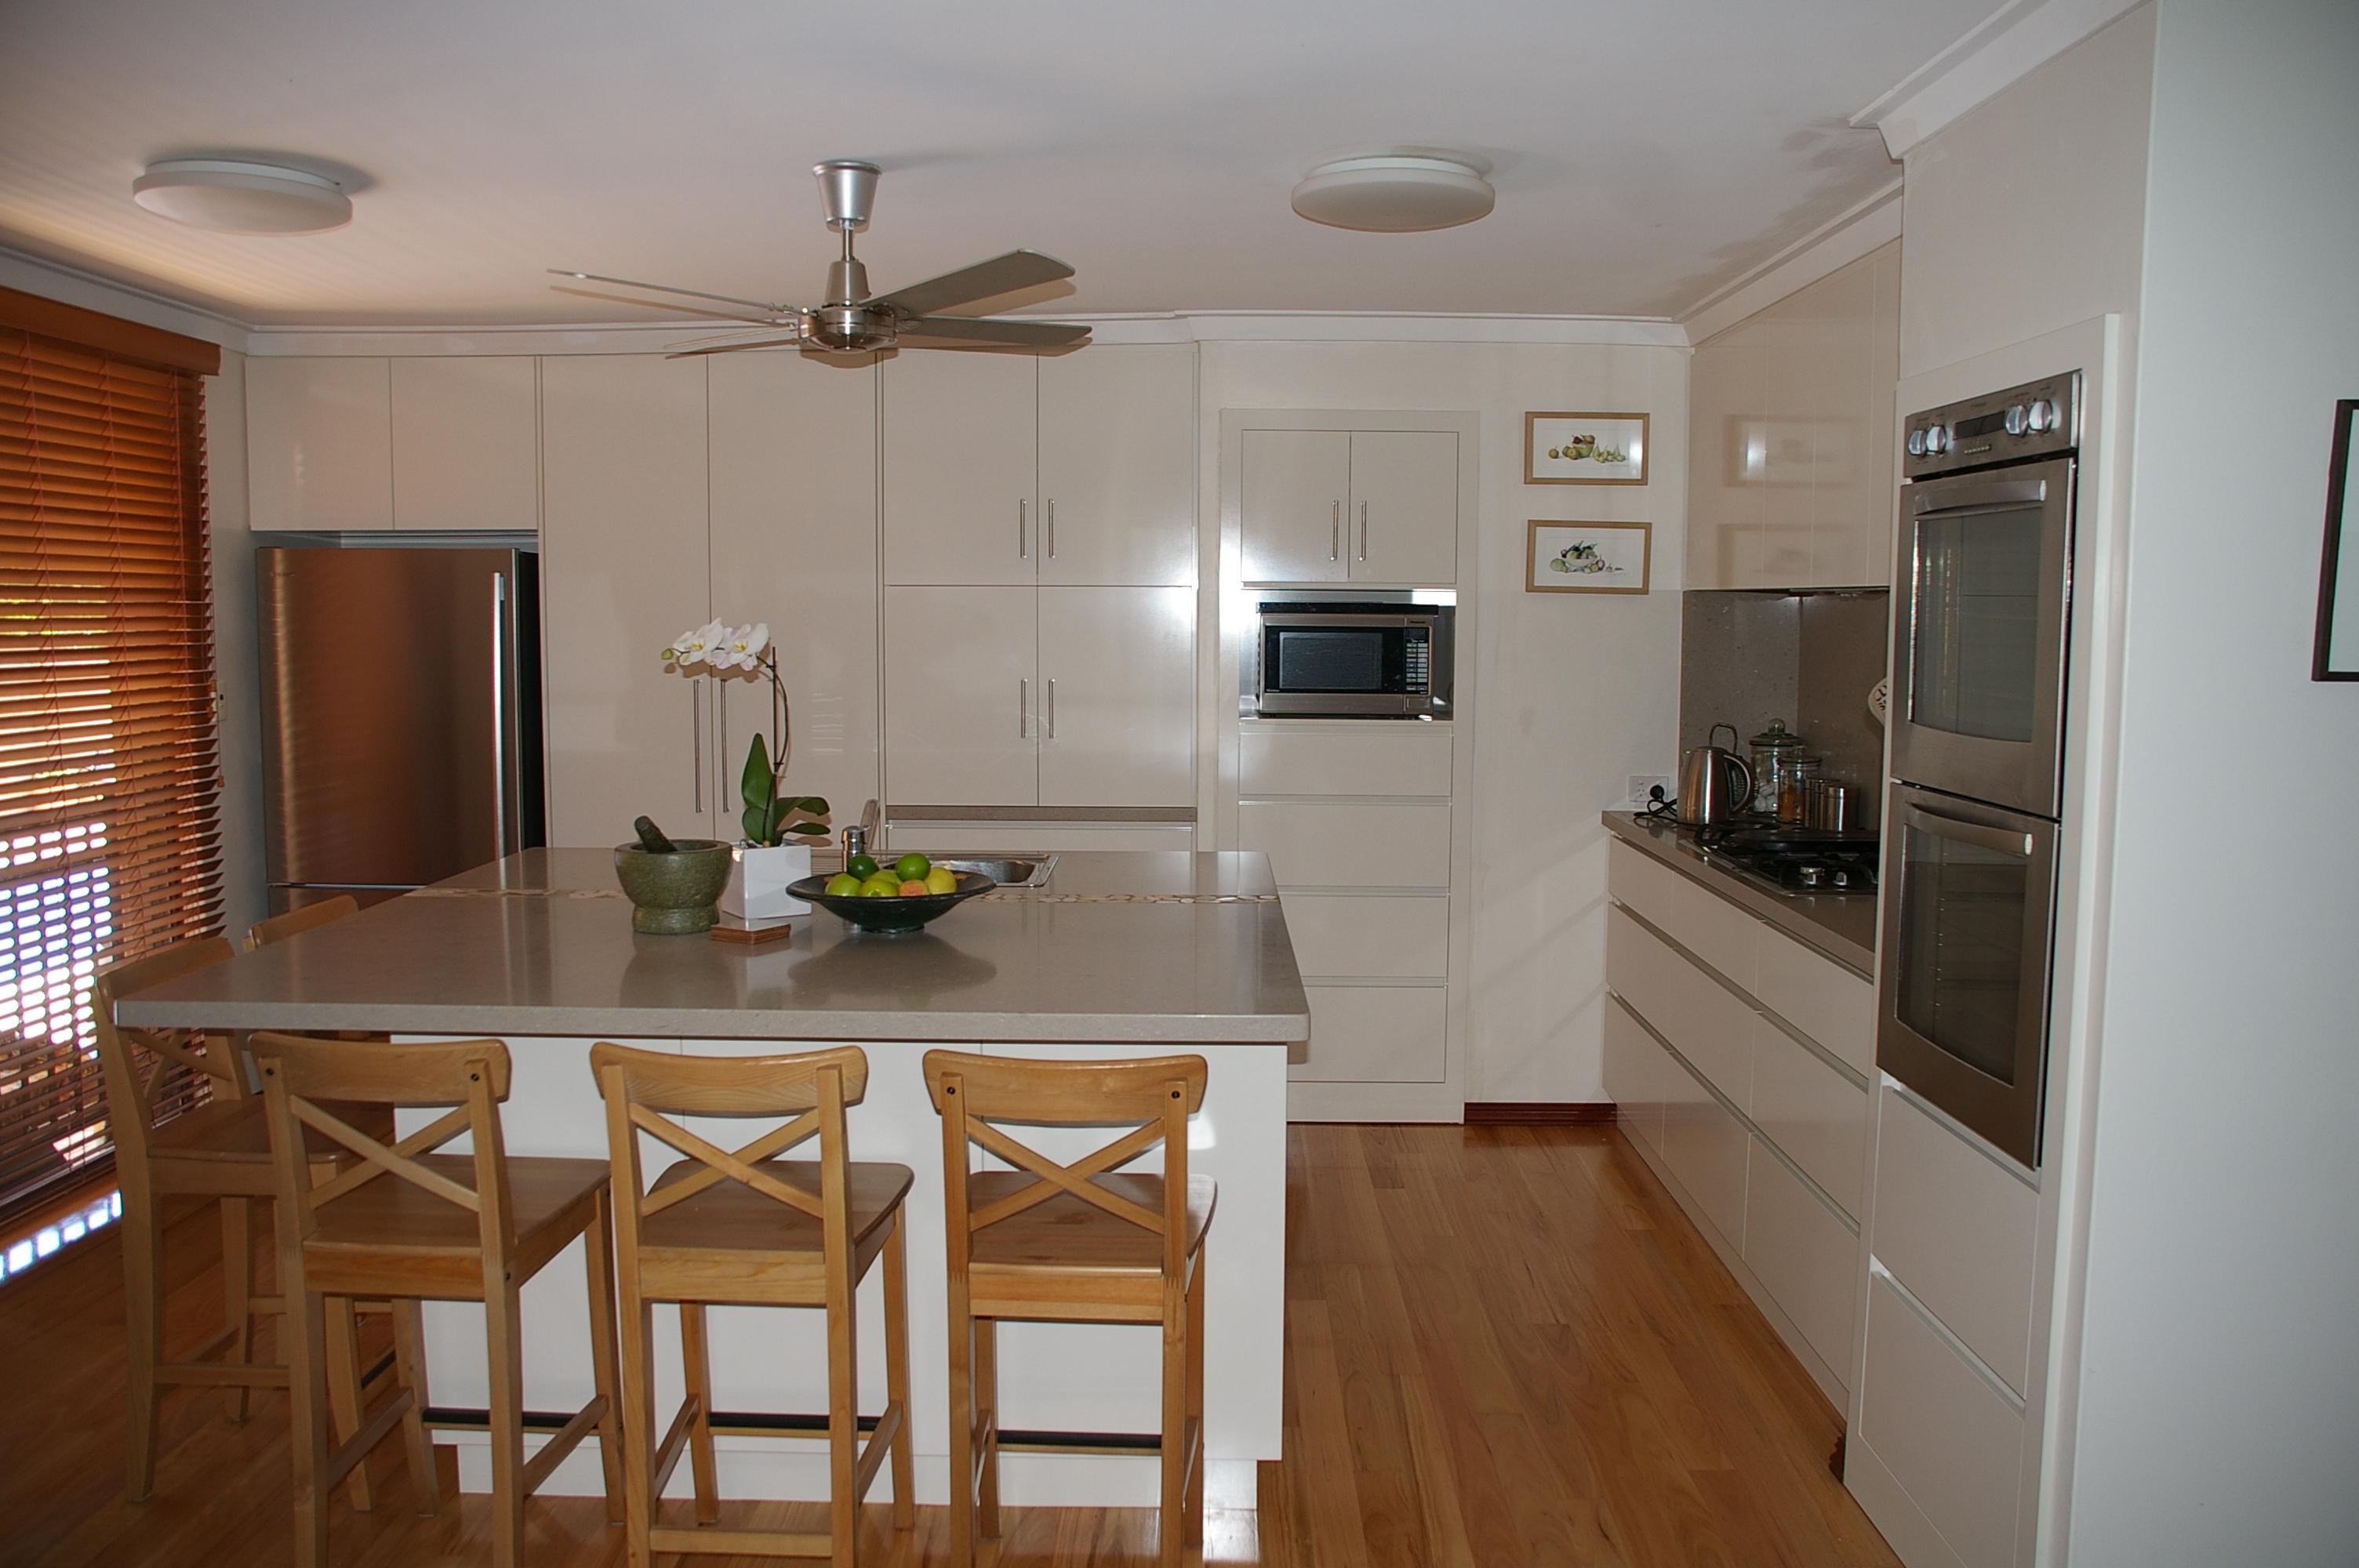 Clohessy kitchen